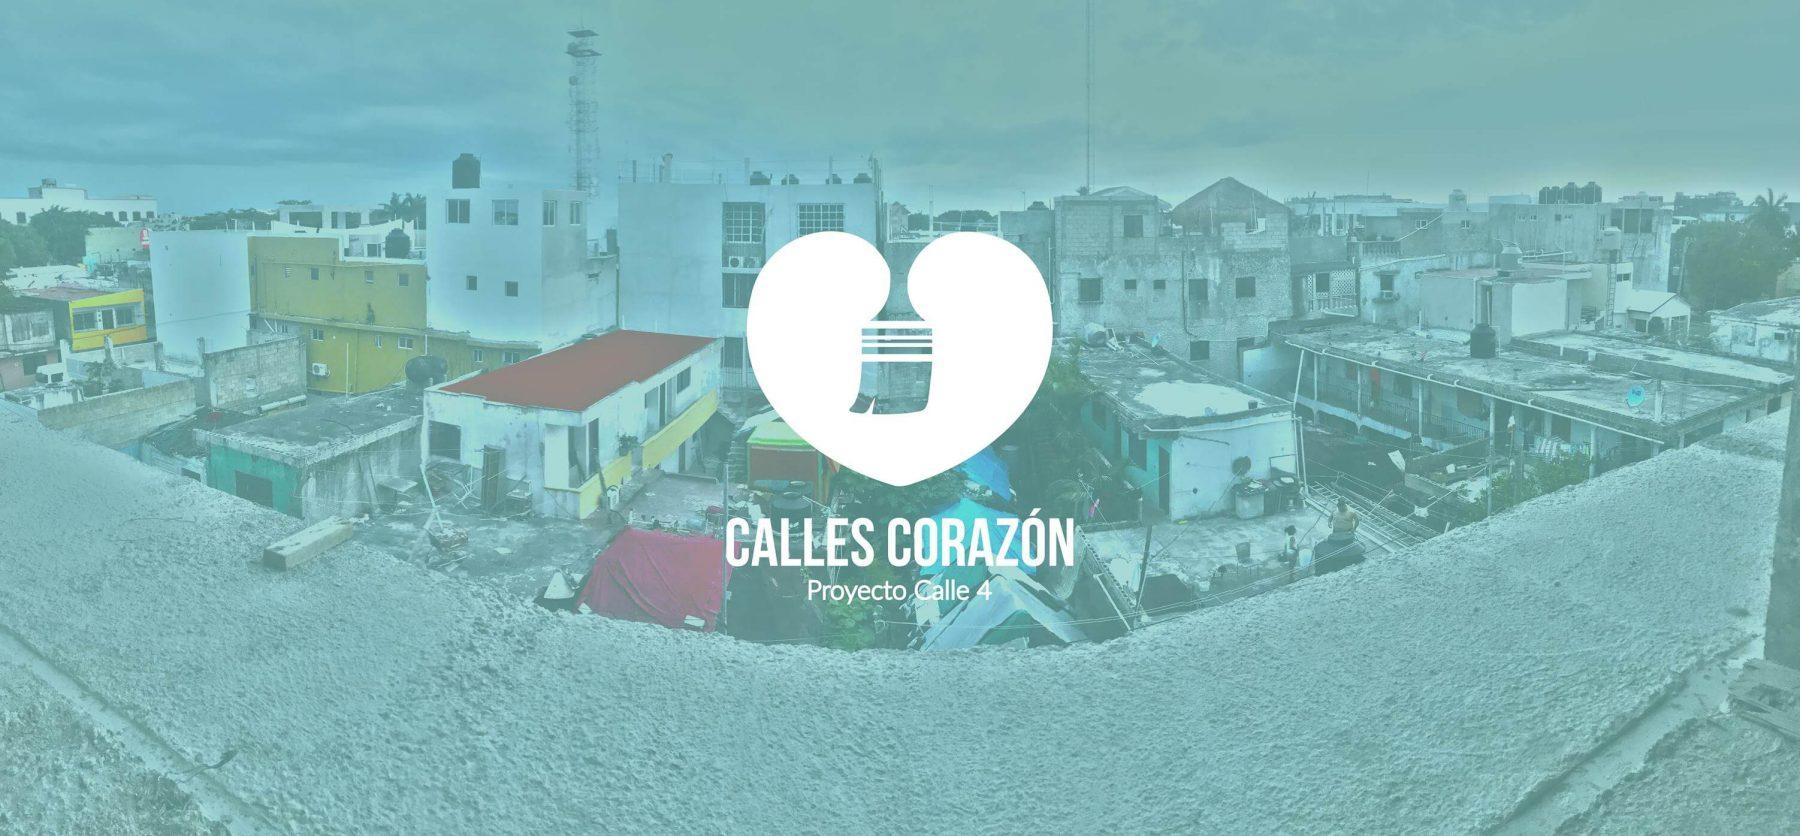 Calles Corazon Project Seeks to Transform Playa del Carmen Through Art